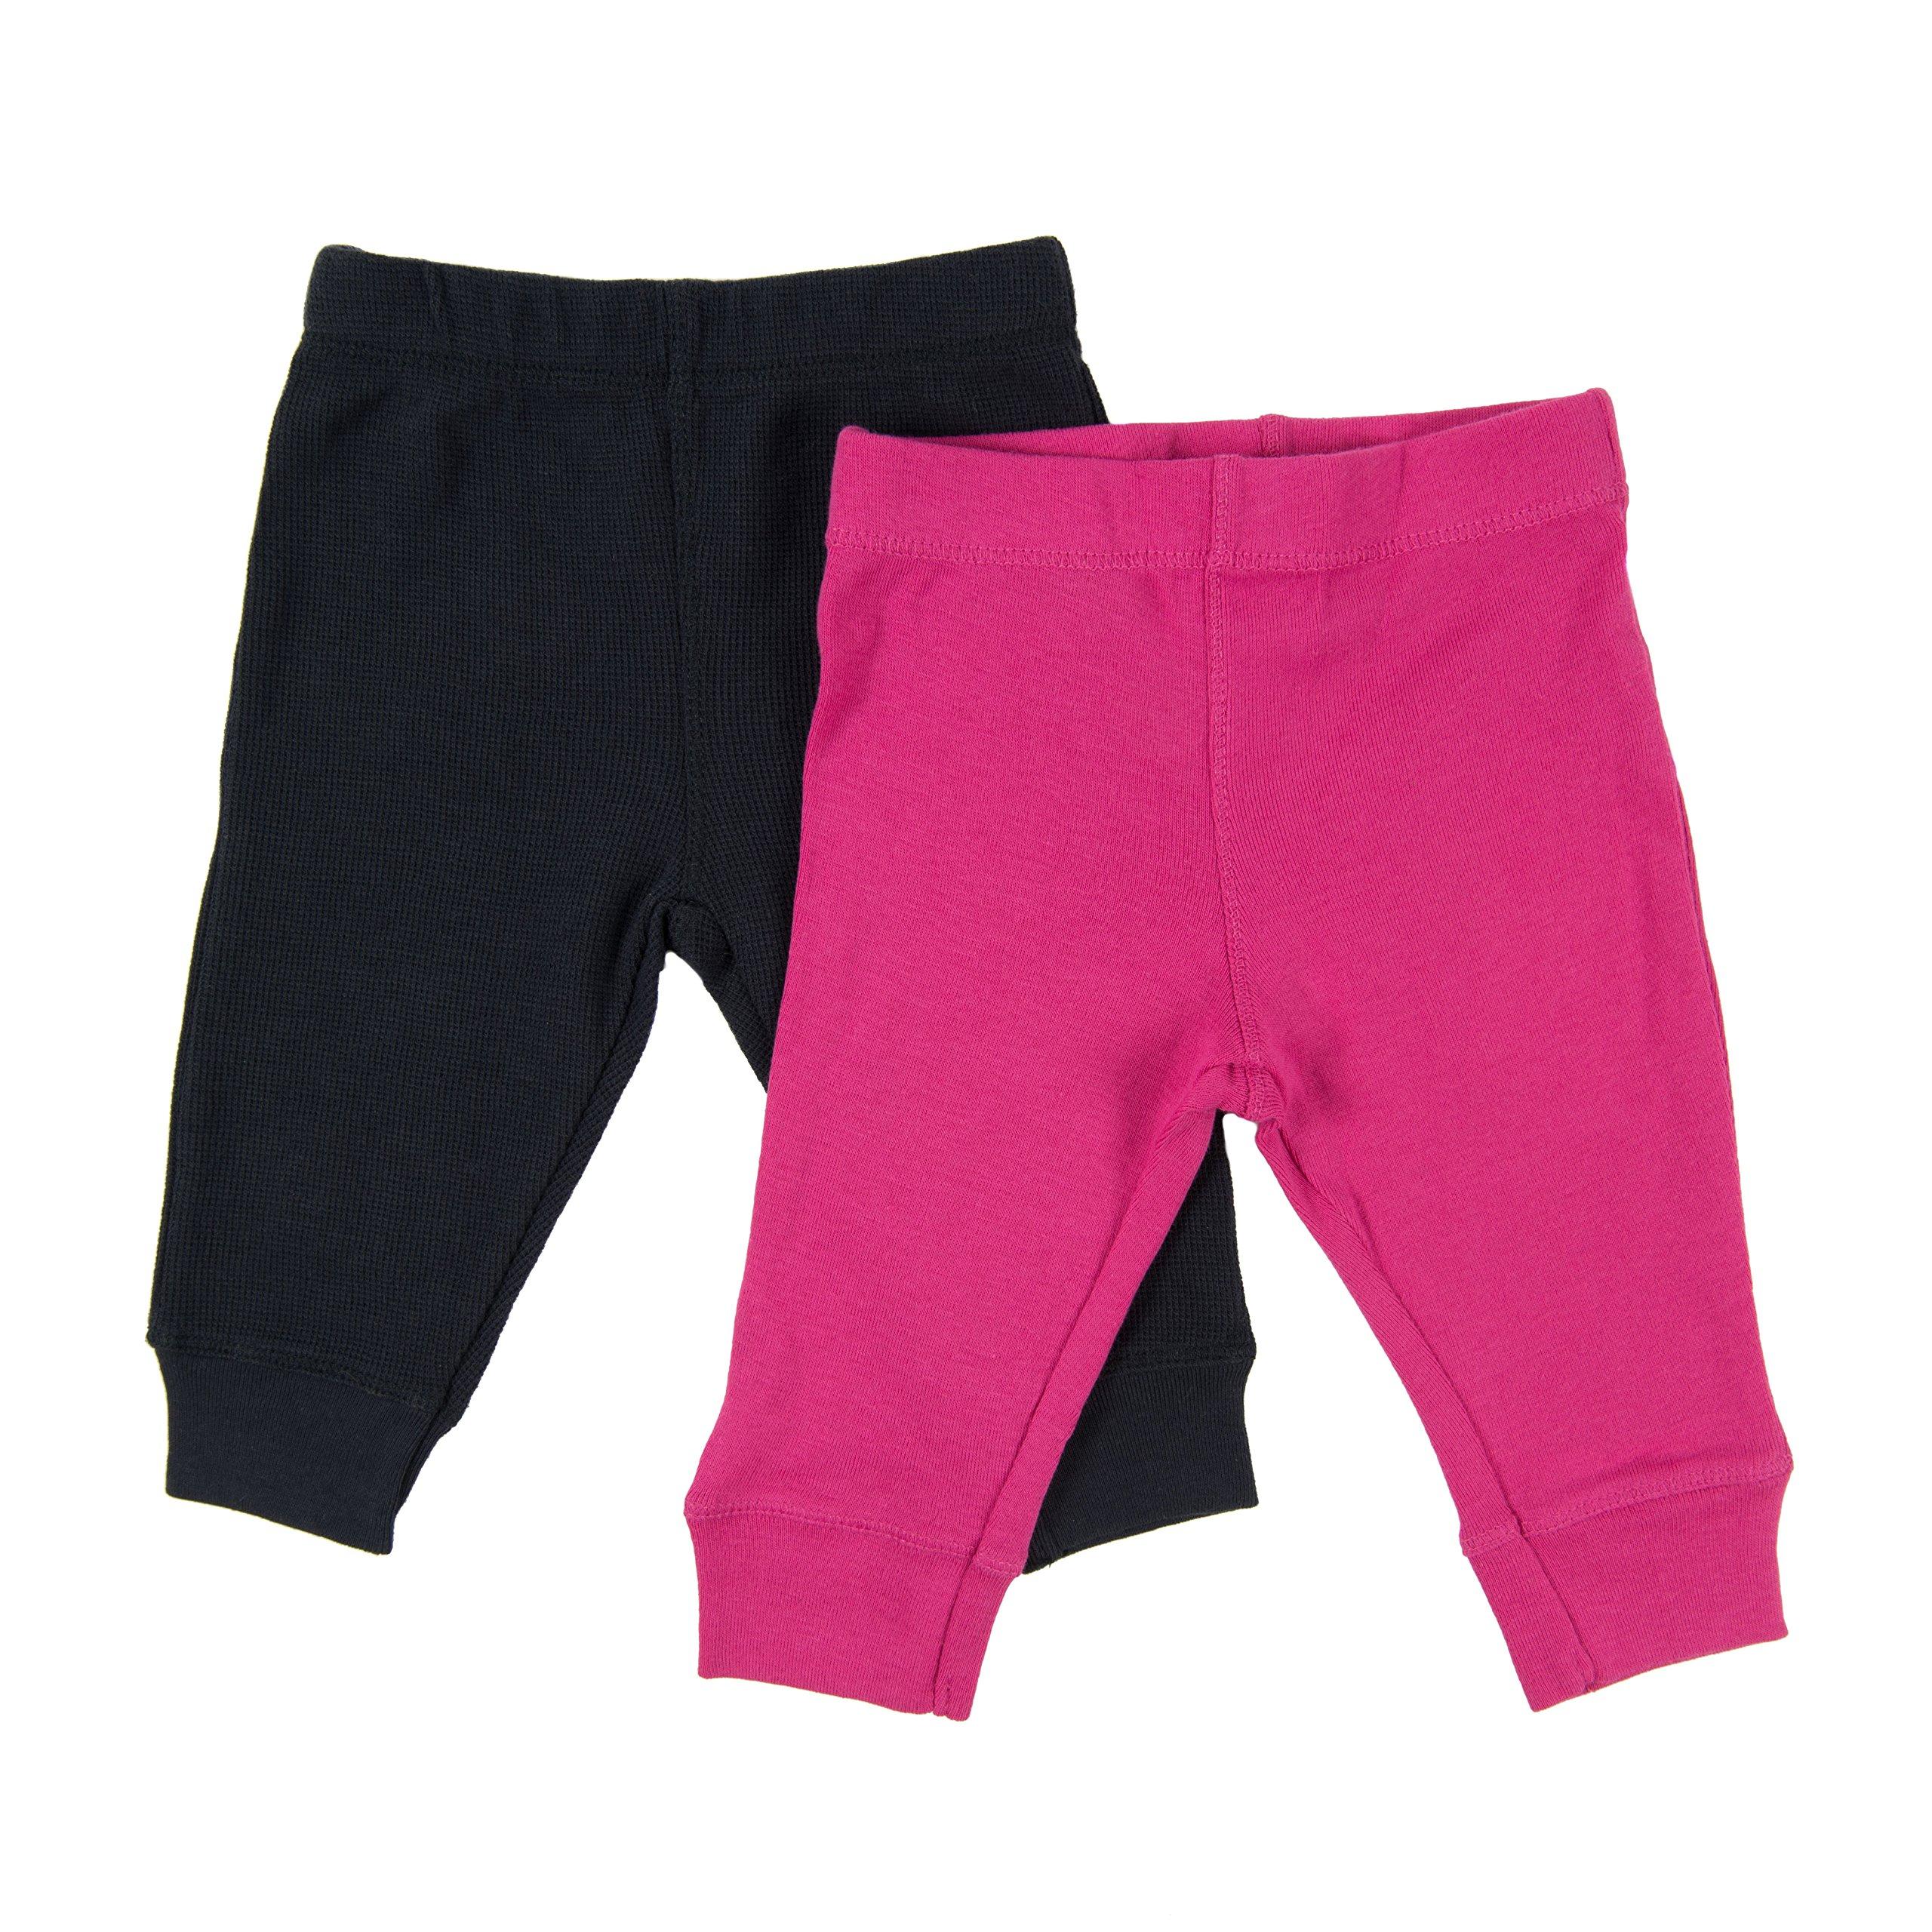 2387464194eb1 Leveret Solid Baby Crawling Pants & Legging Set Kids Baby Pants (Size 3-24